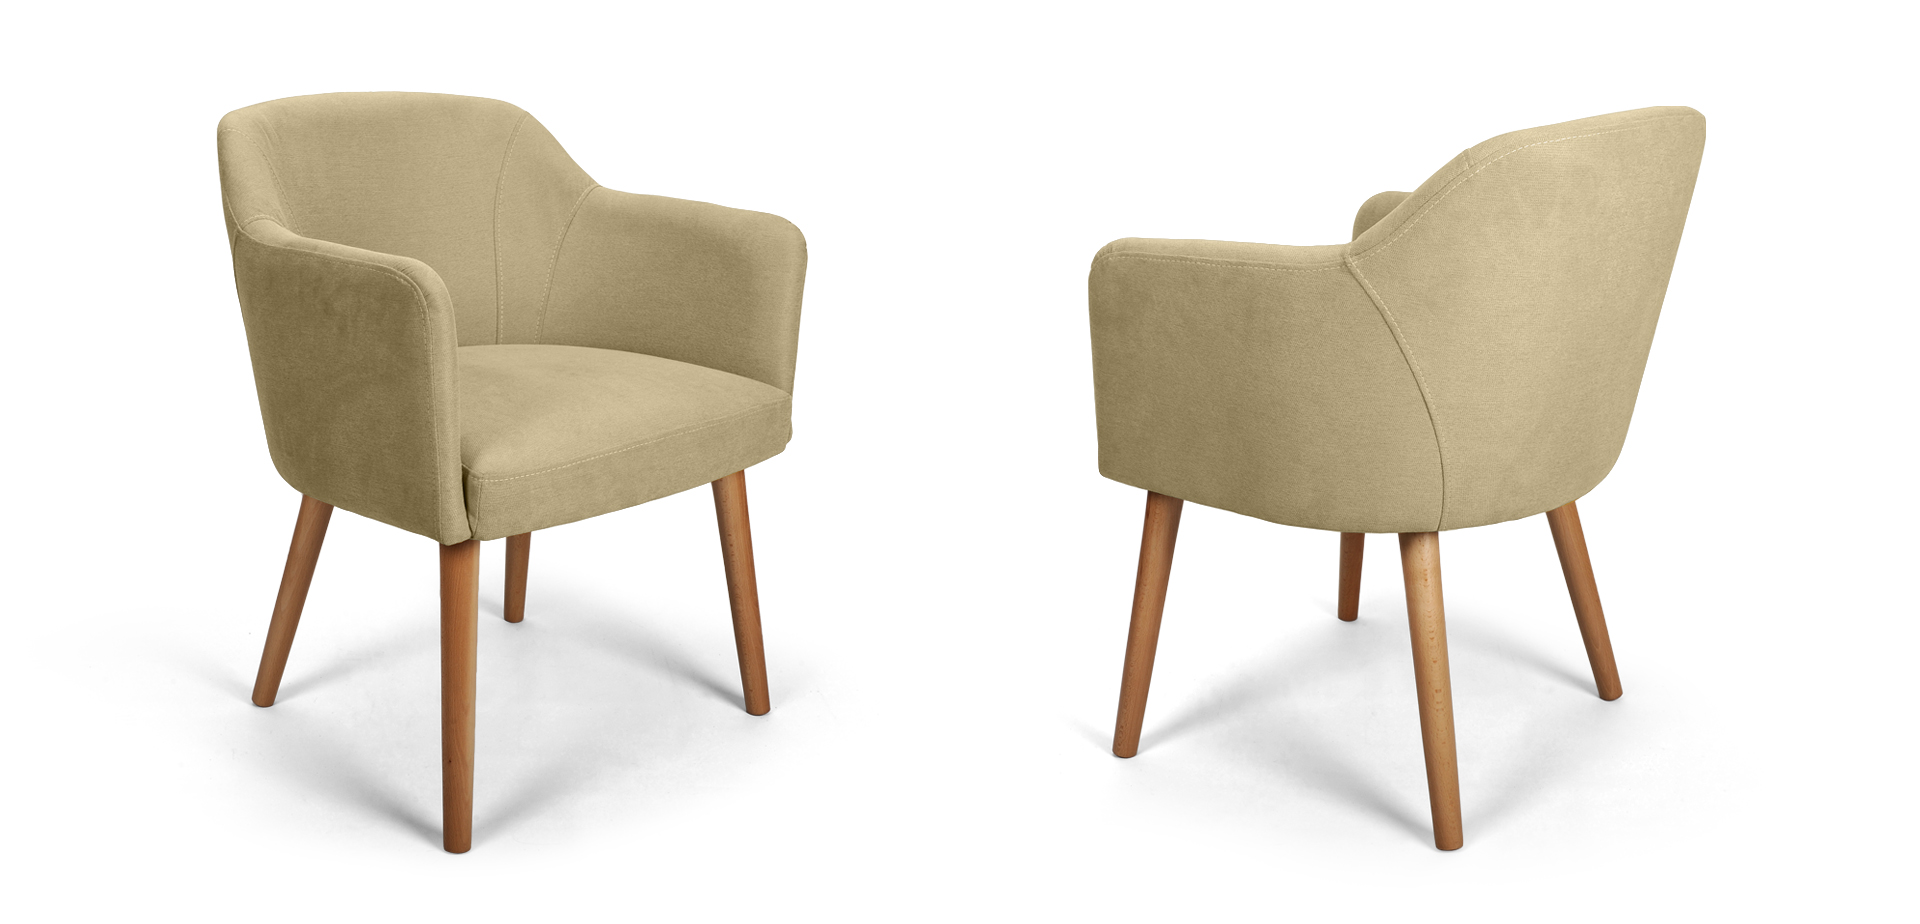 sofia-scaun-02.jpg